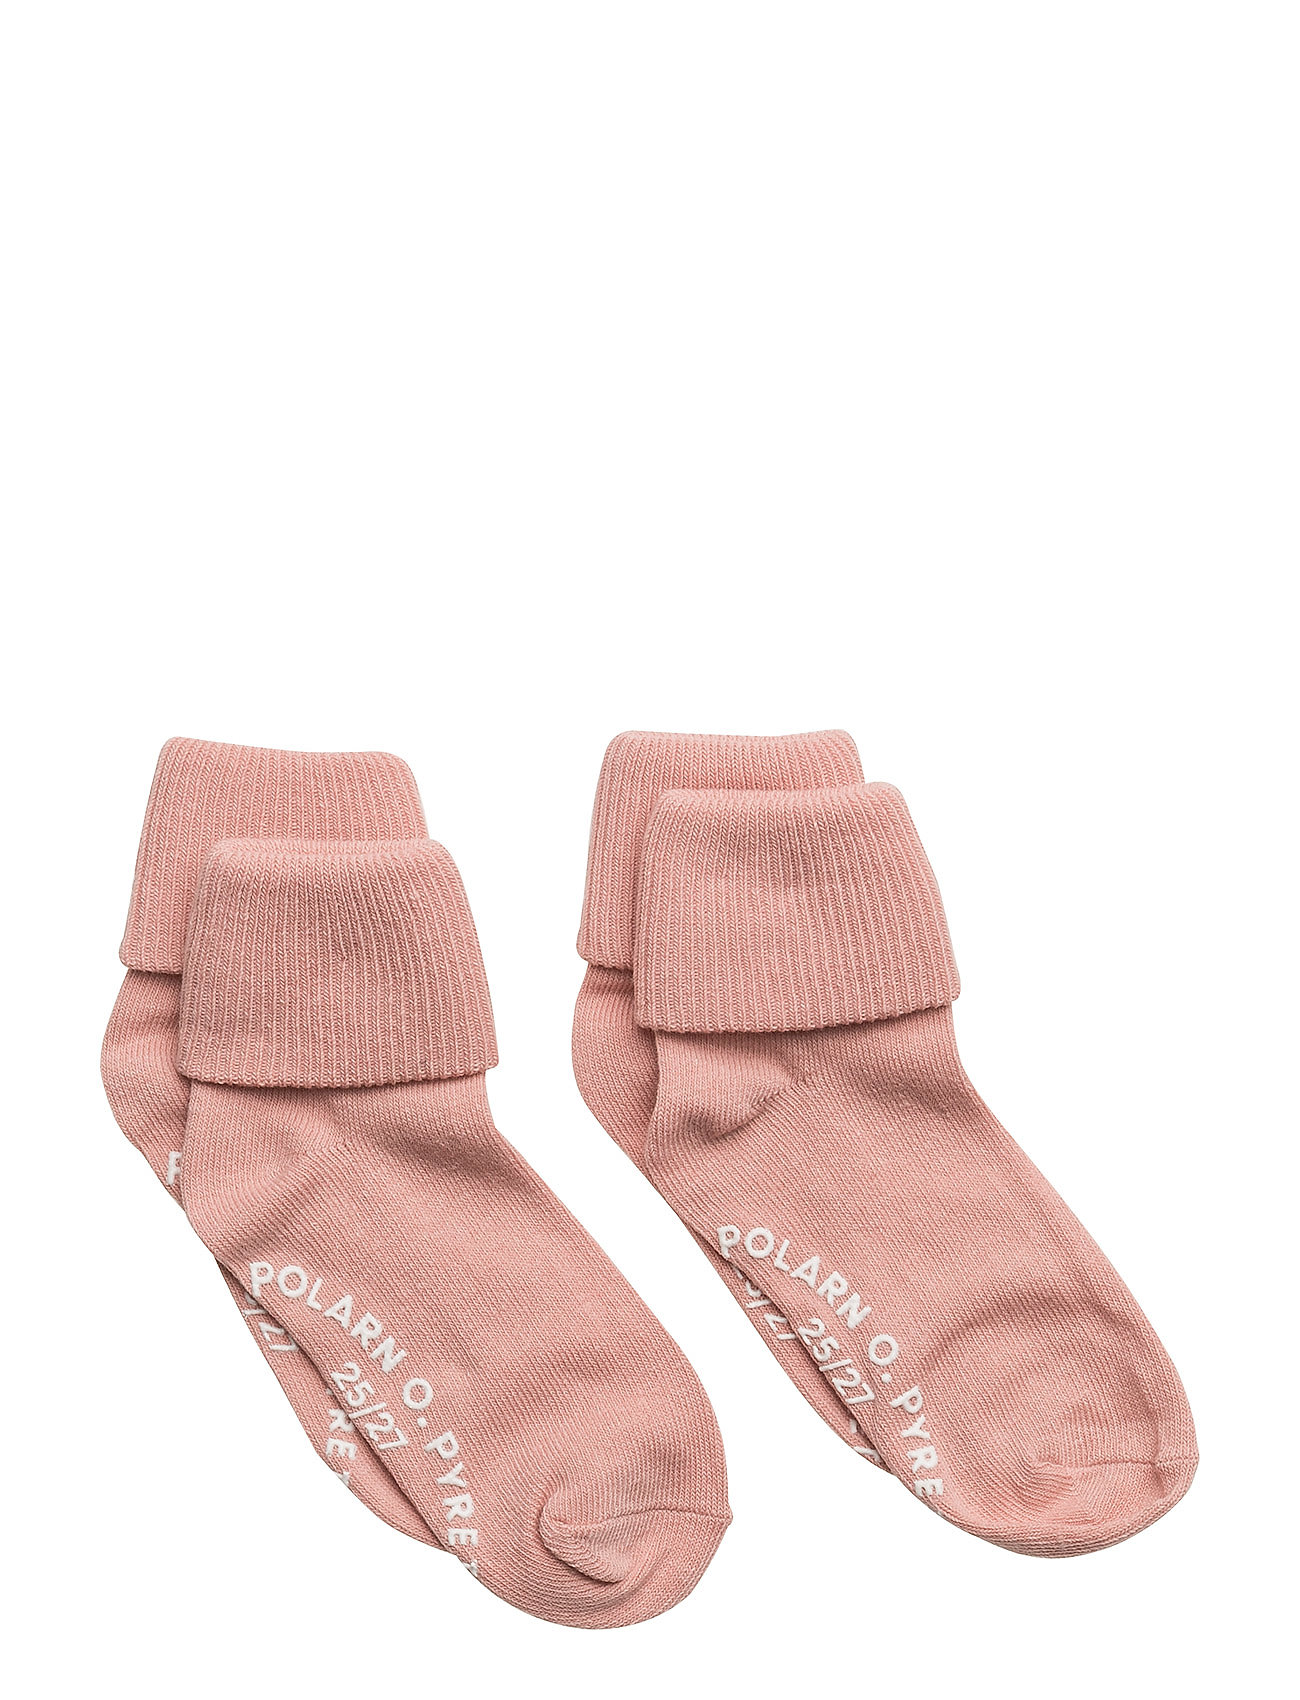 Polarn O. Pyret Sock 2-Pack Solid Preschool